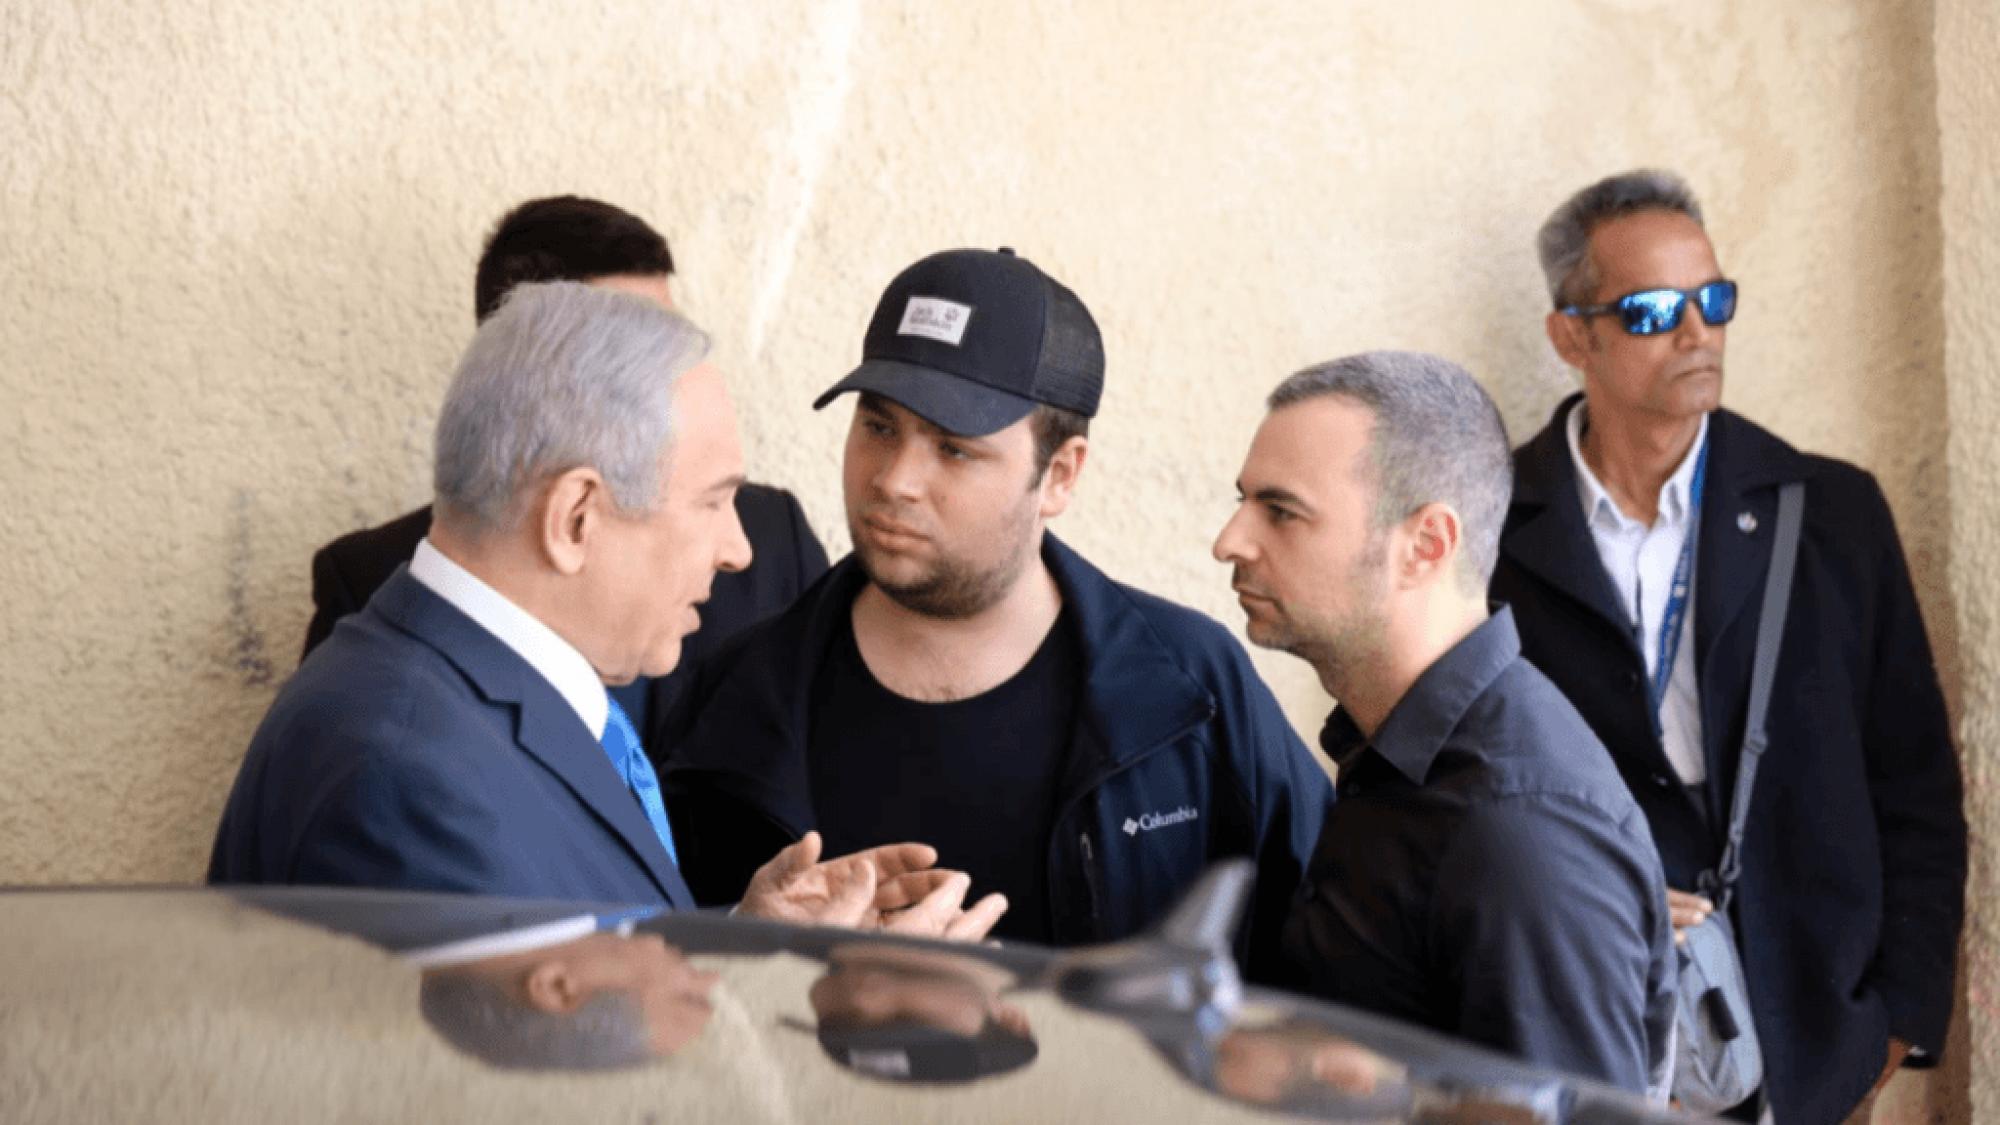 Israel Prime Minister Benjamin Netanyahu speaks with adviser Aaron Klein. Photo courtesy of Likud Party.